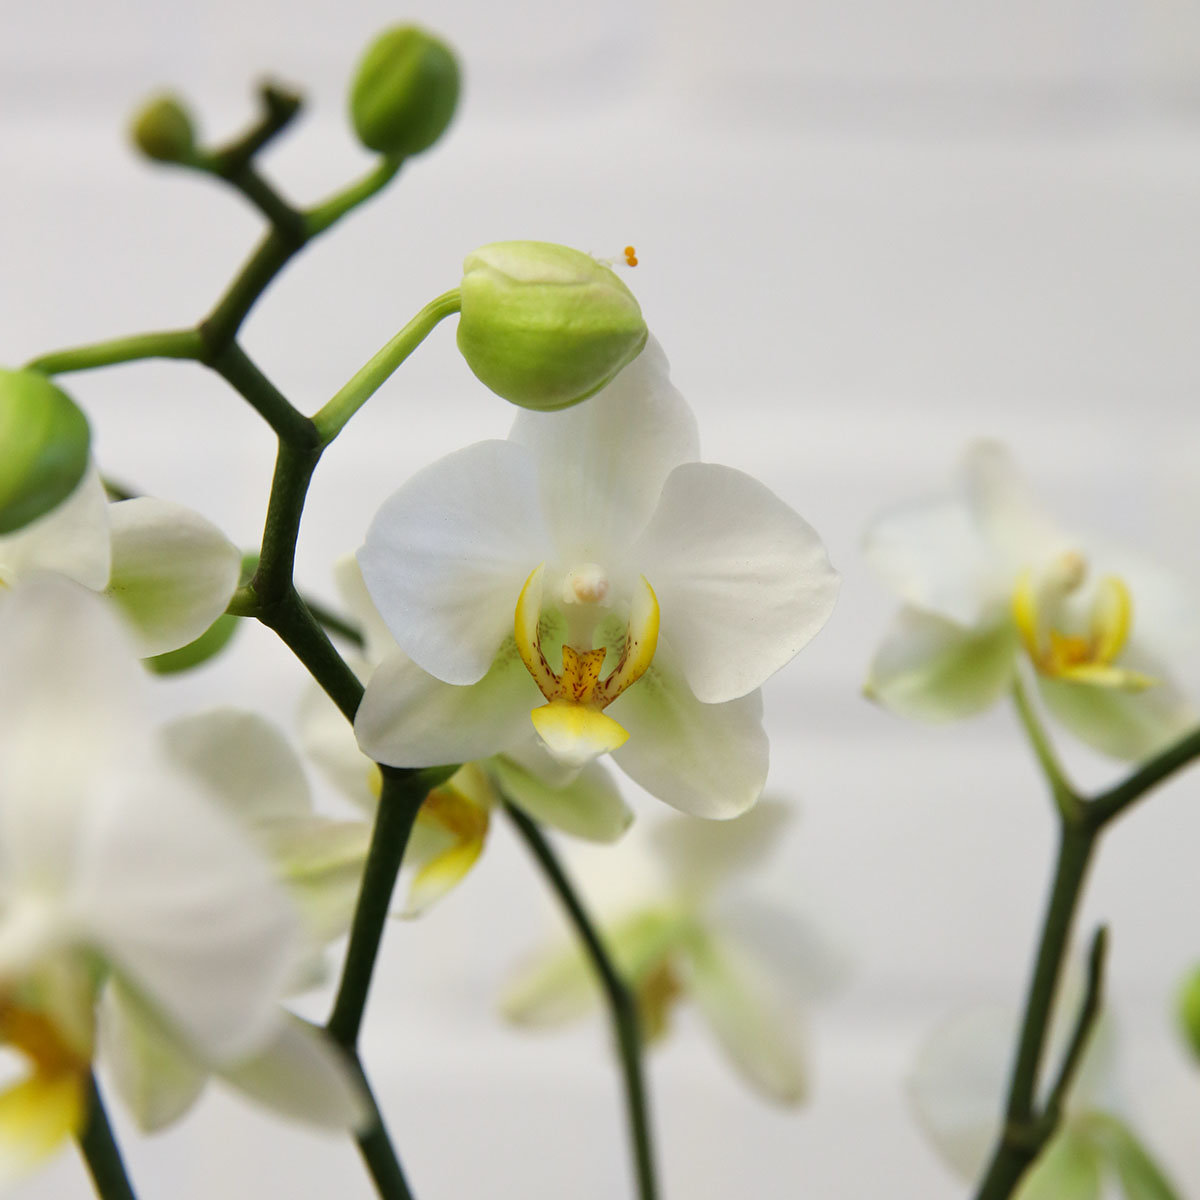 Schmetterlings-Orchidee Lausanne, mehrtriebig, ungestäbt, im ca. 12 cm-Topf   #3